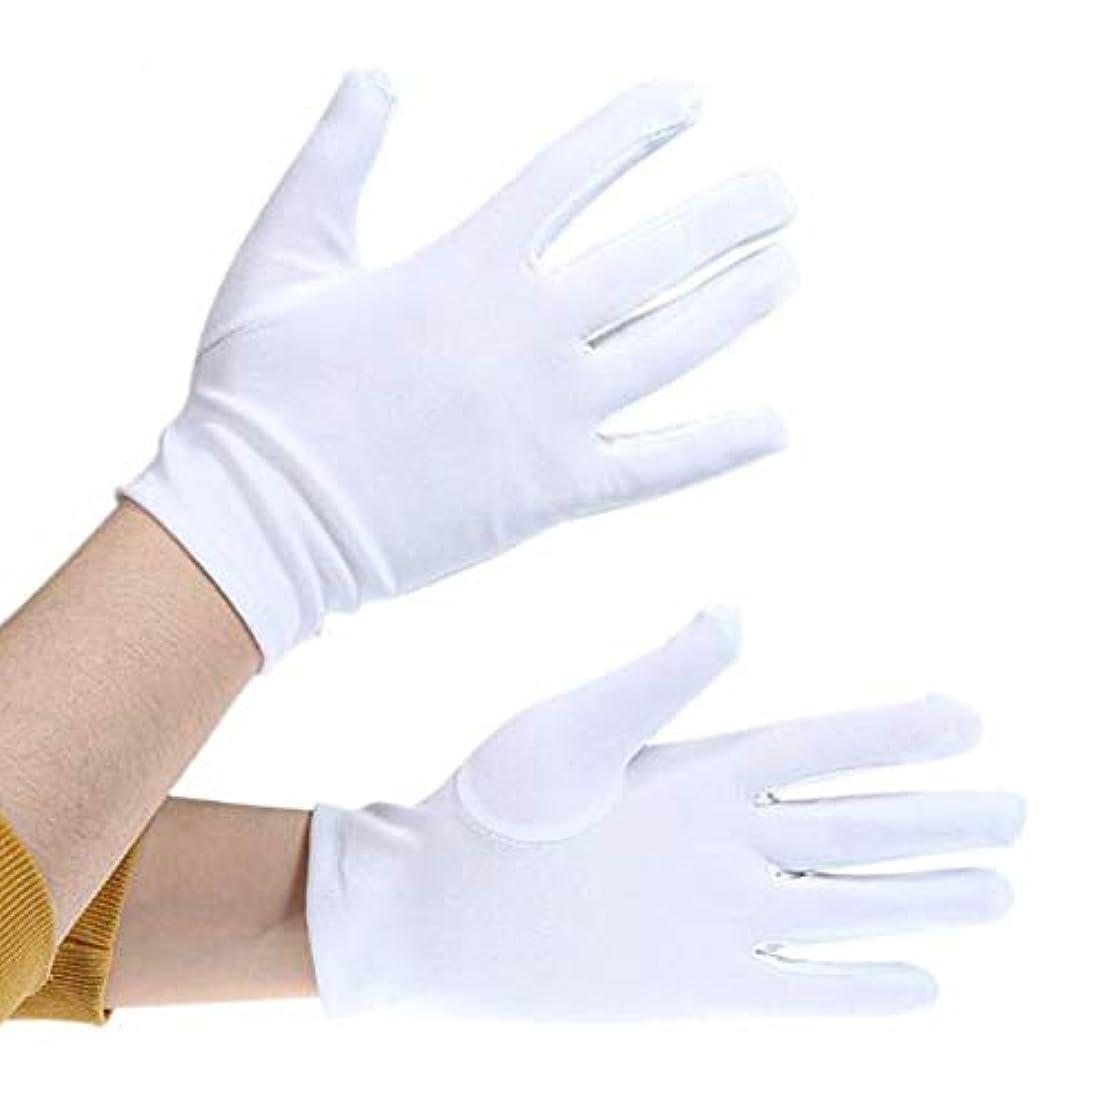 成熟有力者防水白手袋薄 礼装用 ジュエリーグローブ時計 貴金属 宝石 接客用 品質管理用 作業用手ぶくろ,保護着用者